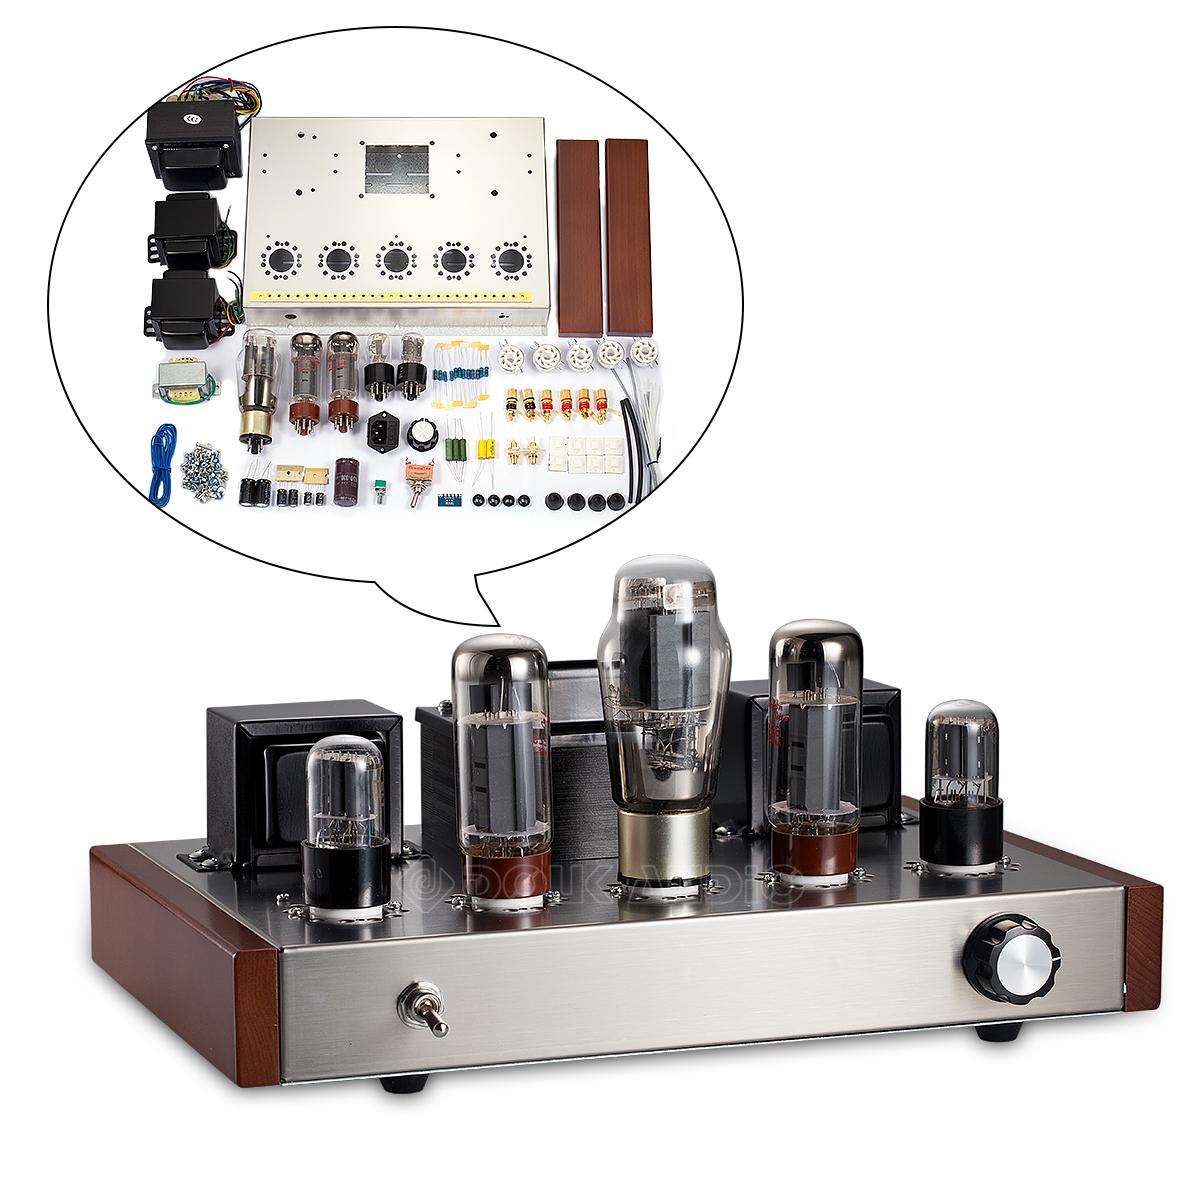 hifi el34 valve tube amplifier stereo home audio integrated power amp diy kit 9320703803847 ebay. Black Bedroom Furniture Sets. Home Design Ideas